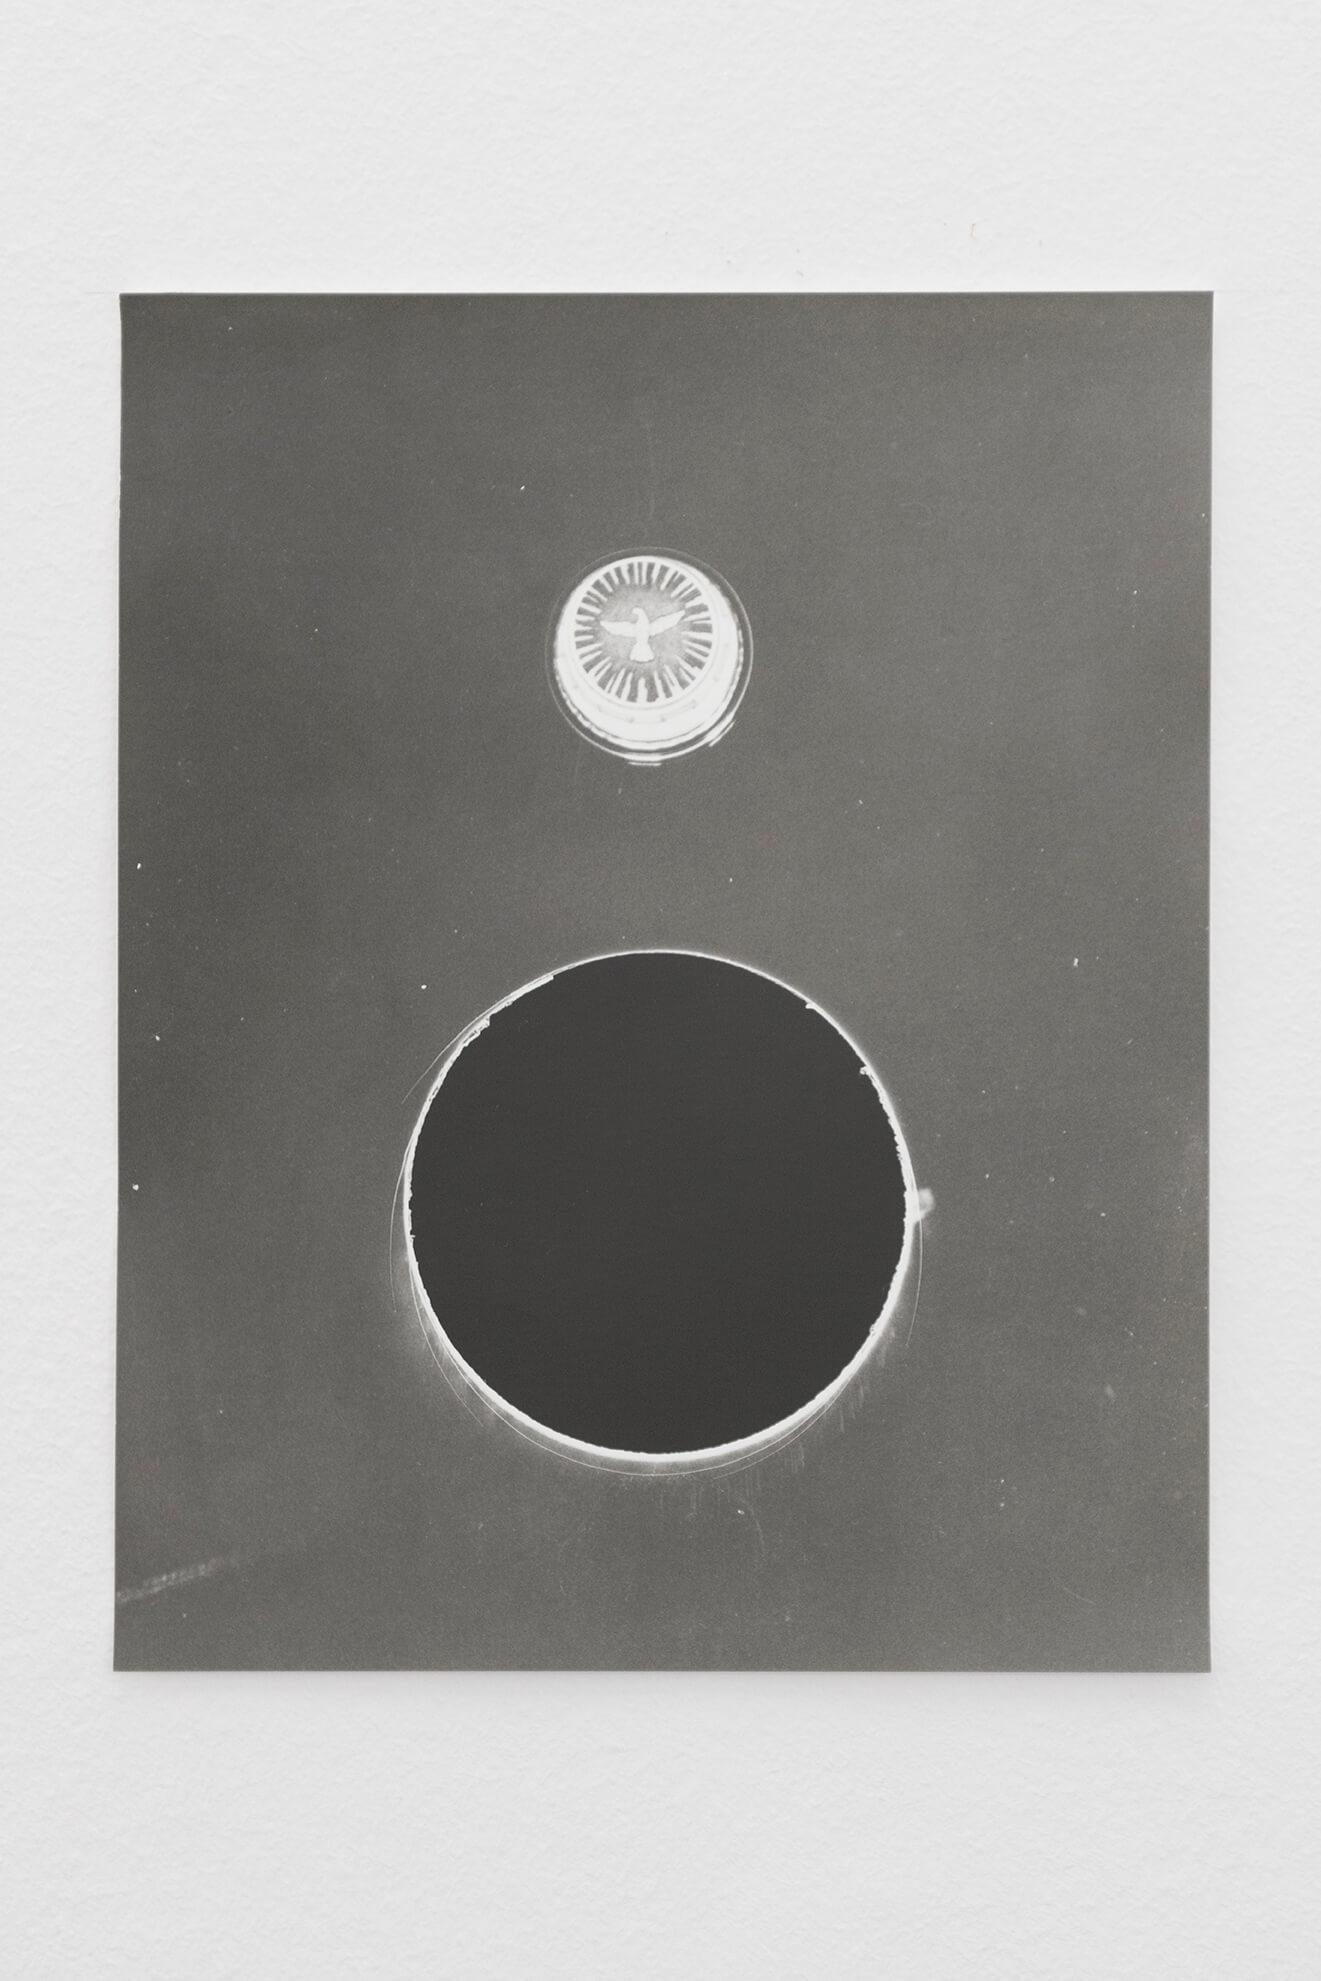 Untitled (Accidental hole), 2021 | JOCHEN LEMPERT: VISIBLE LIGHT | ProjecteSD